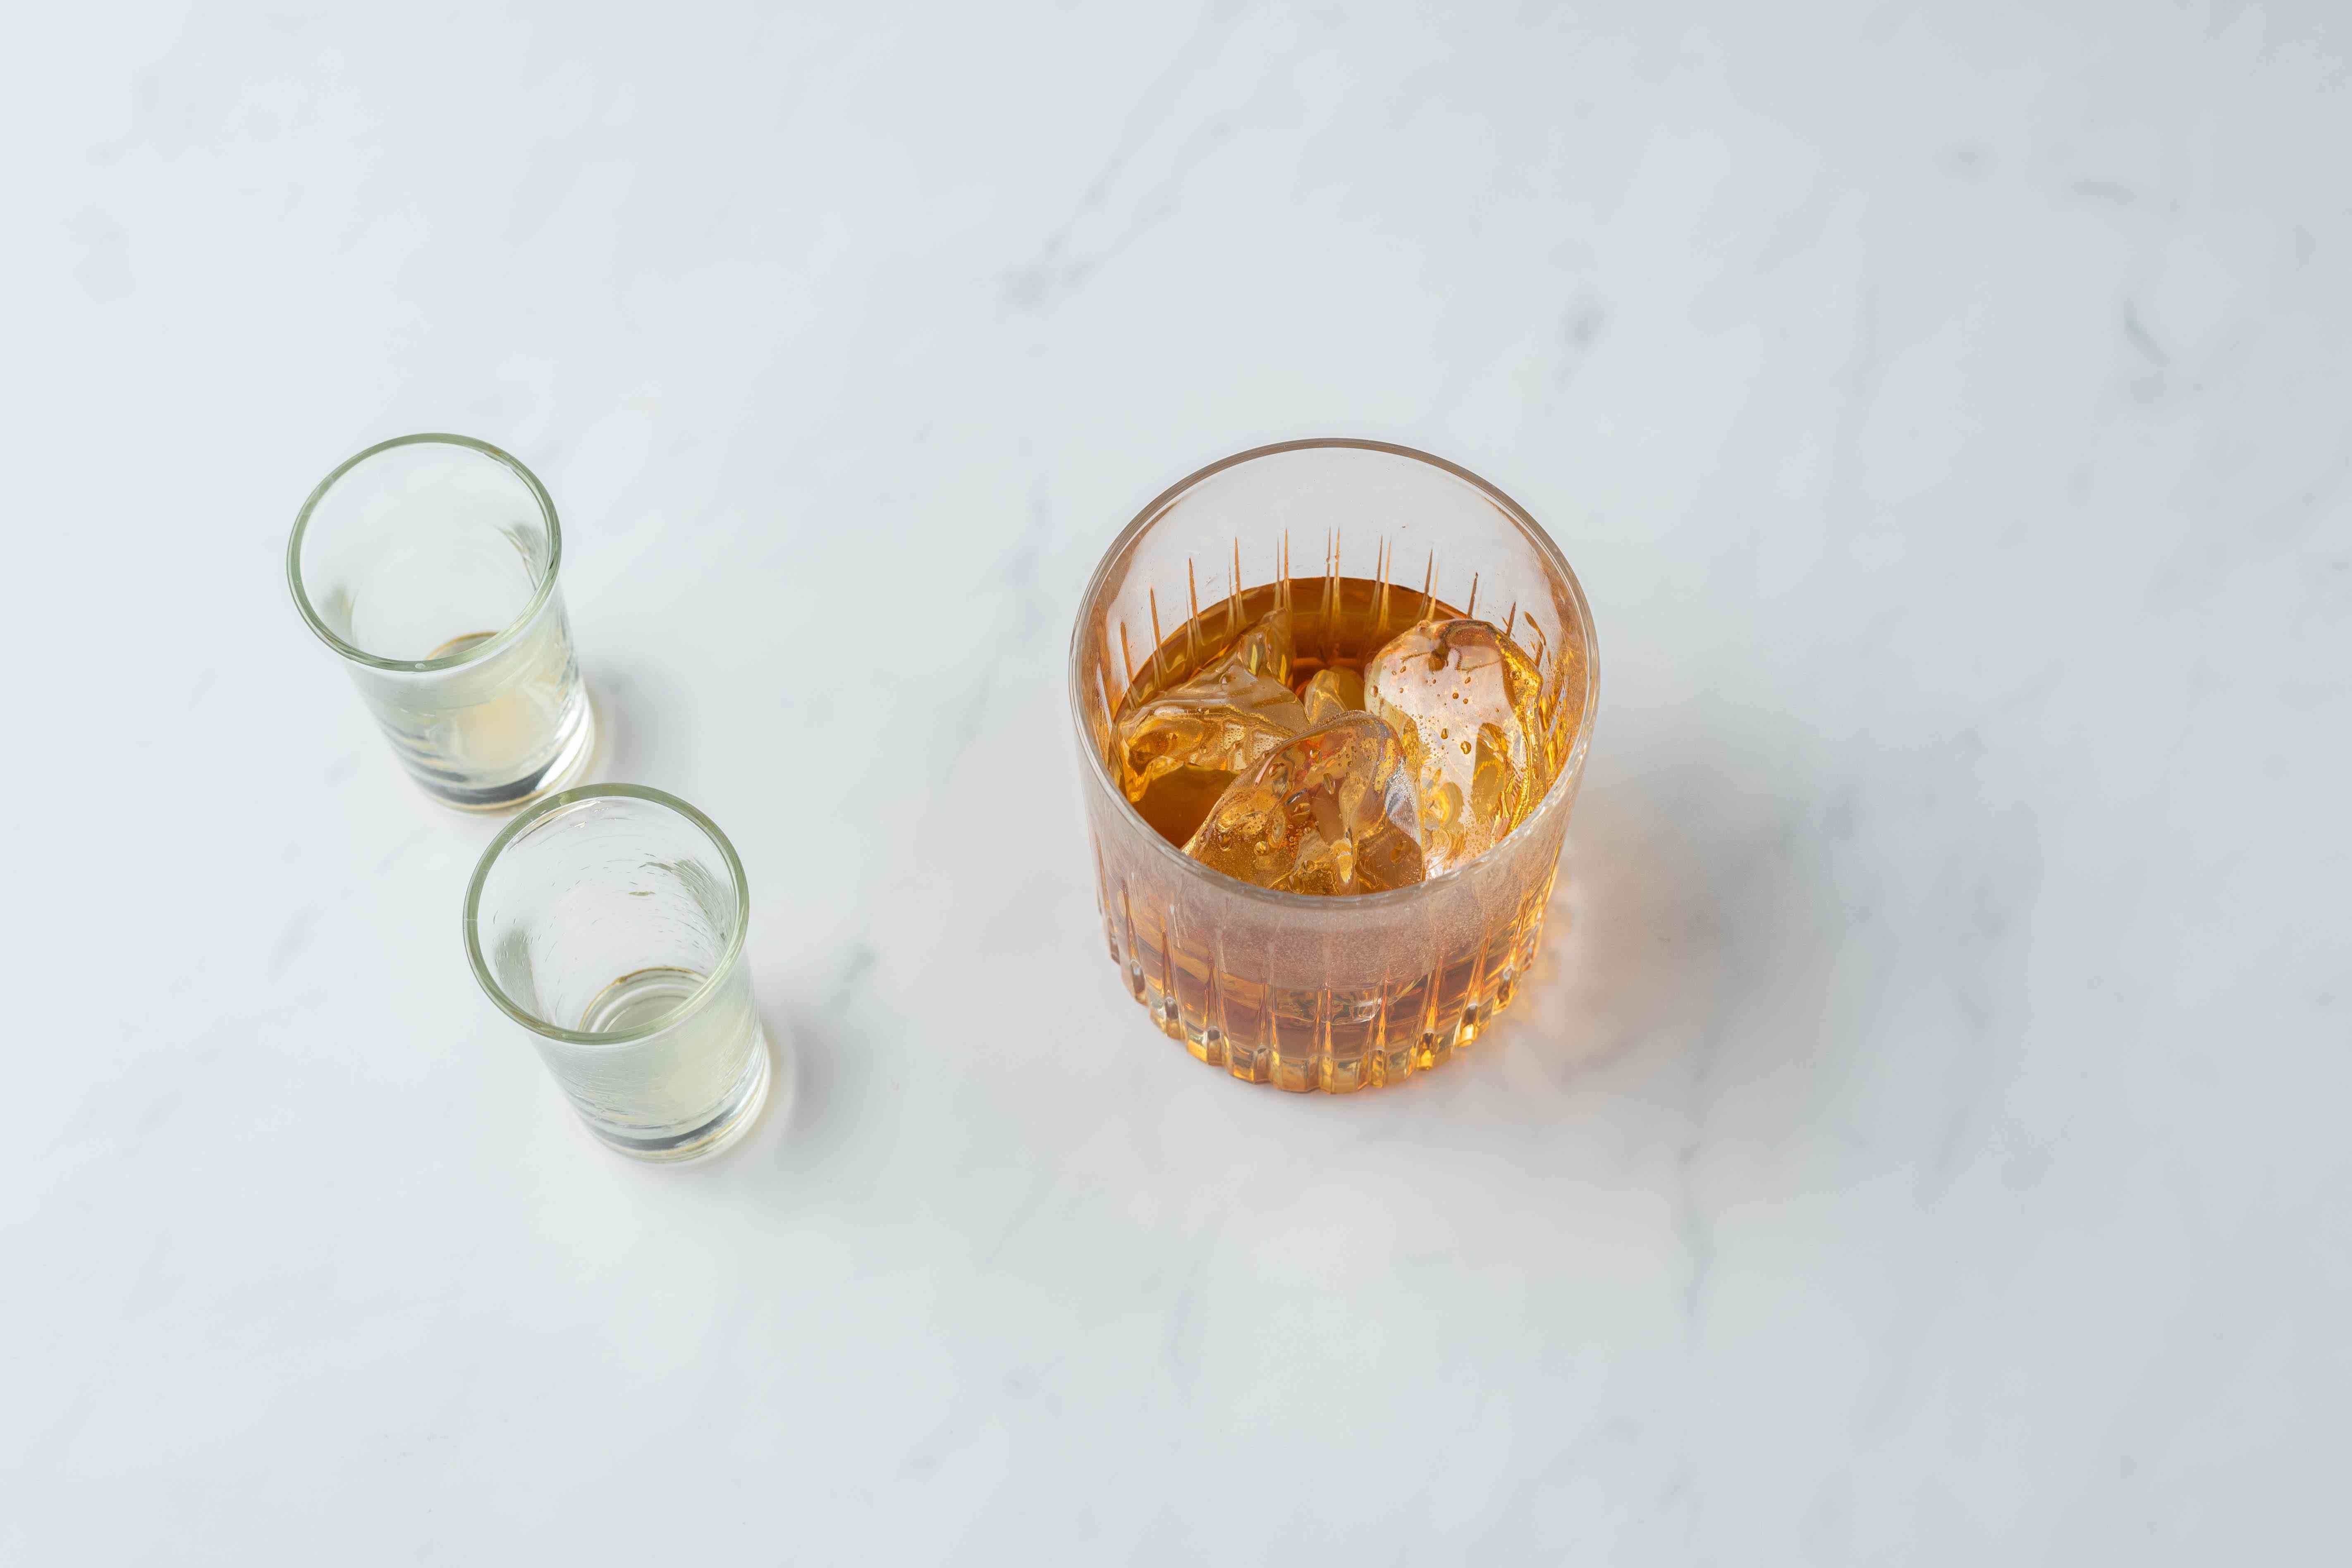 cognac and amaretto liqueur in a glass